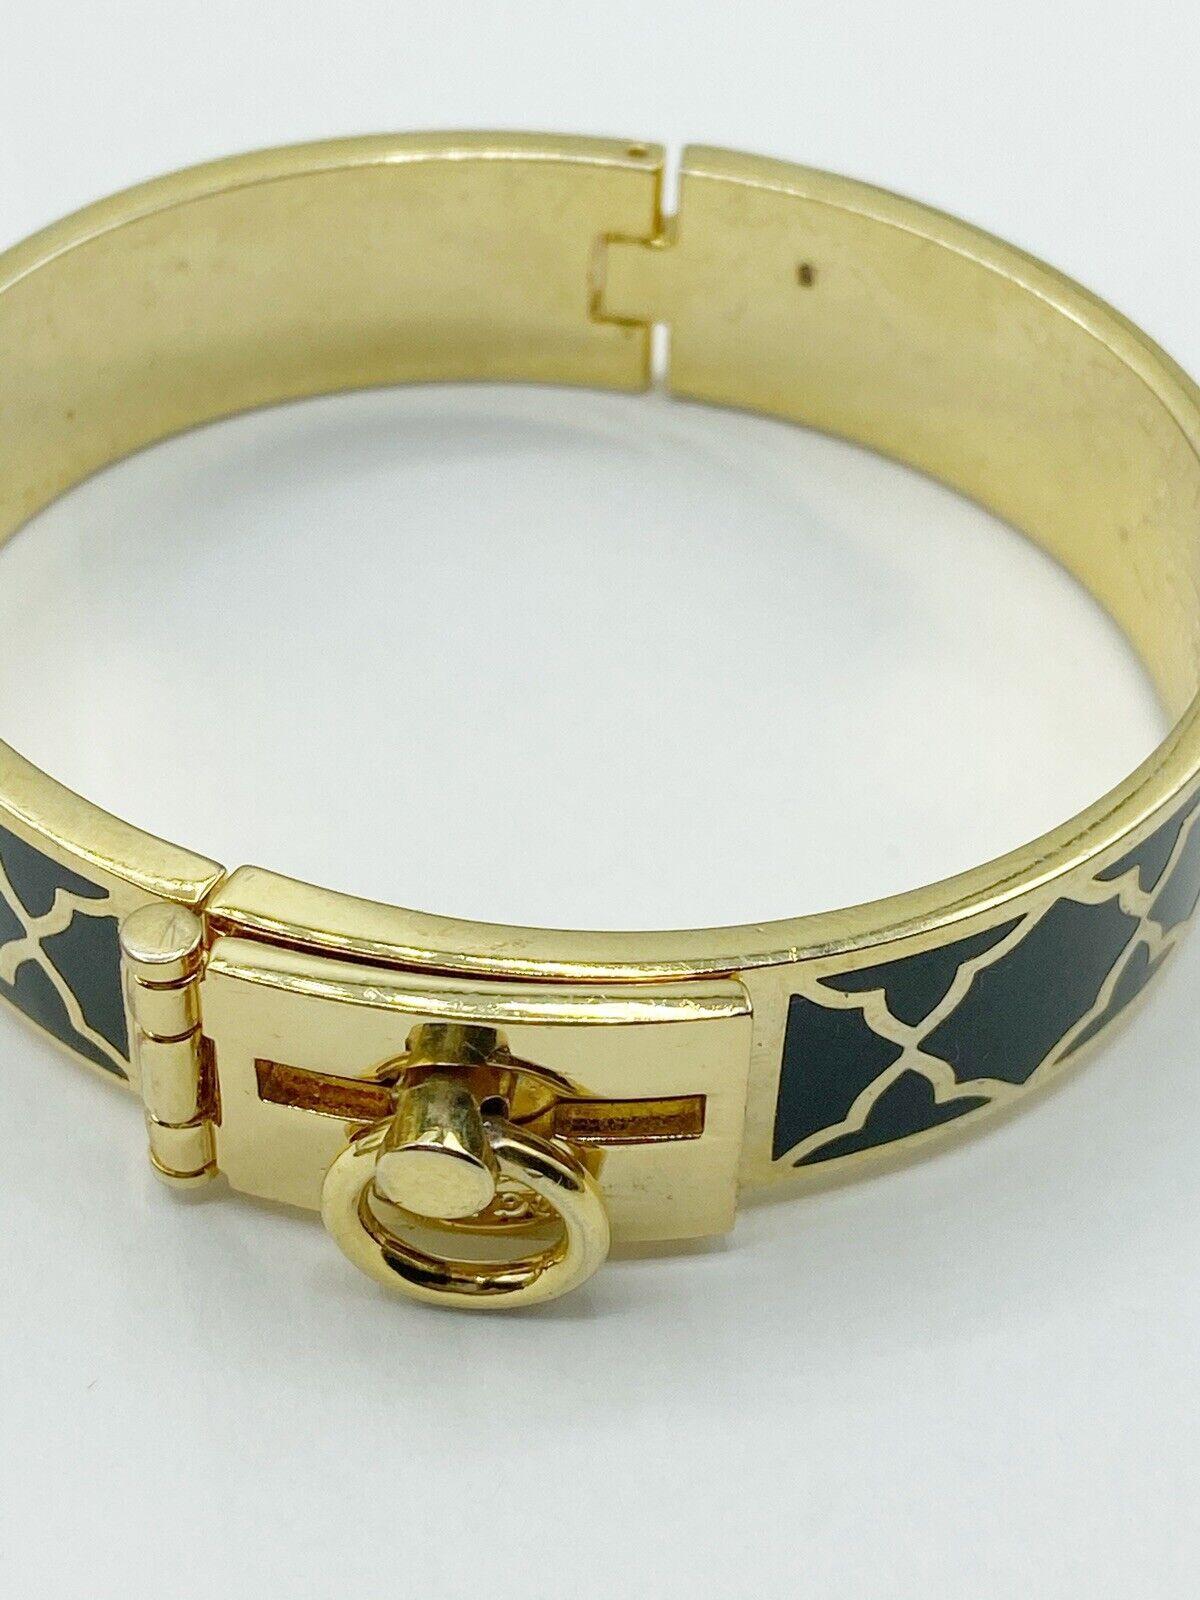 Spartina Bangle Clamper Bracelet Black And Gold Tone